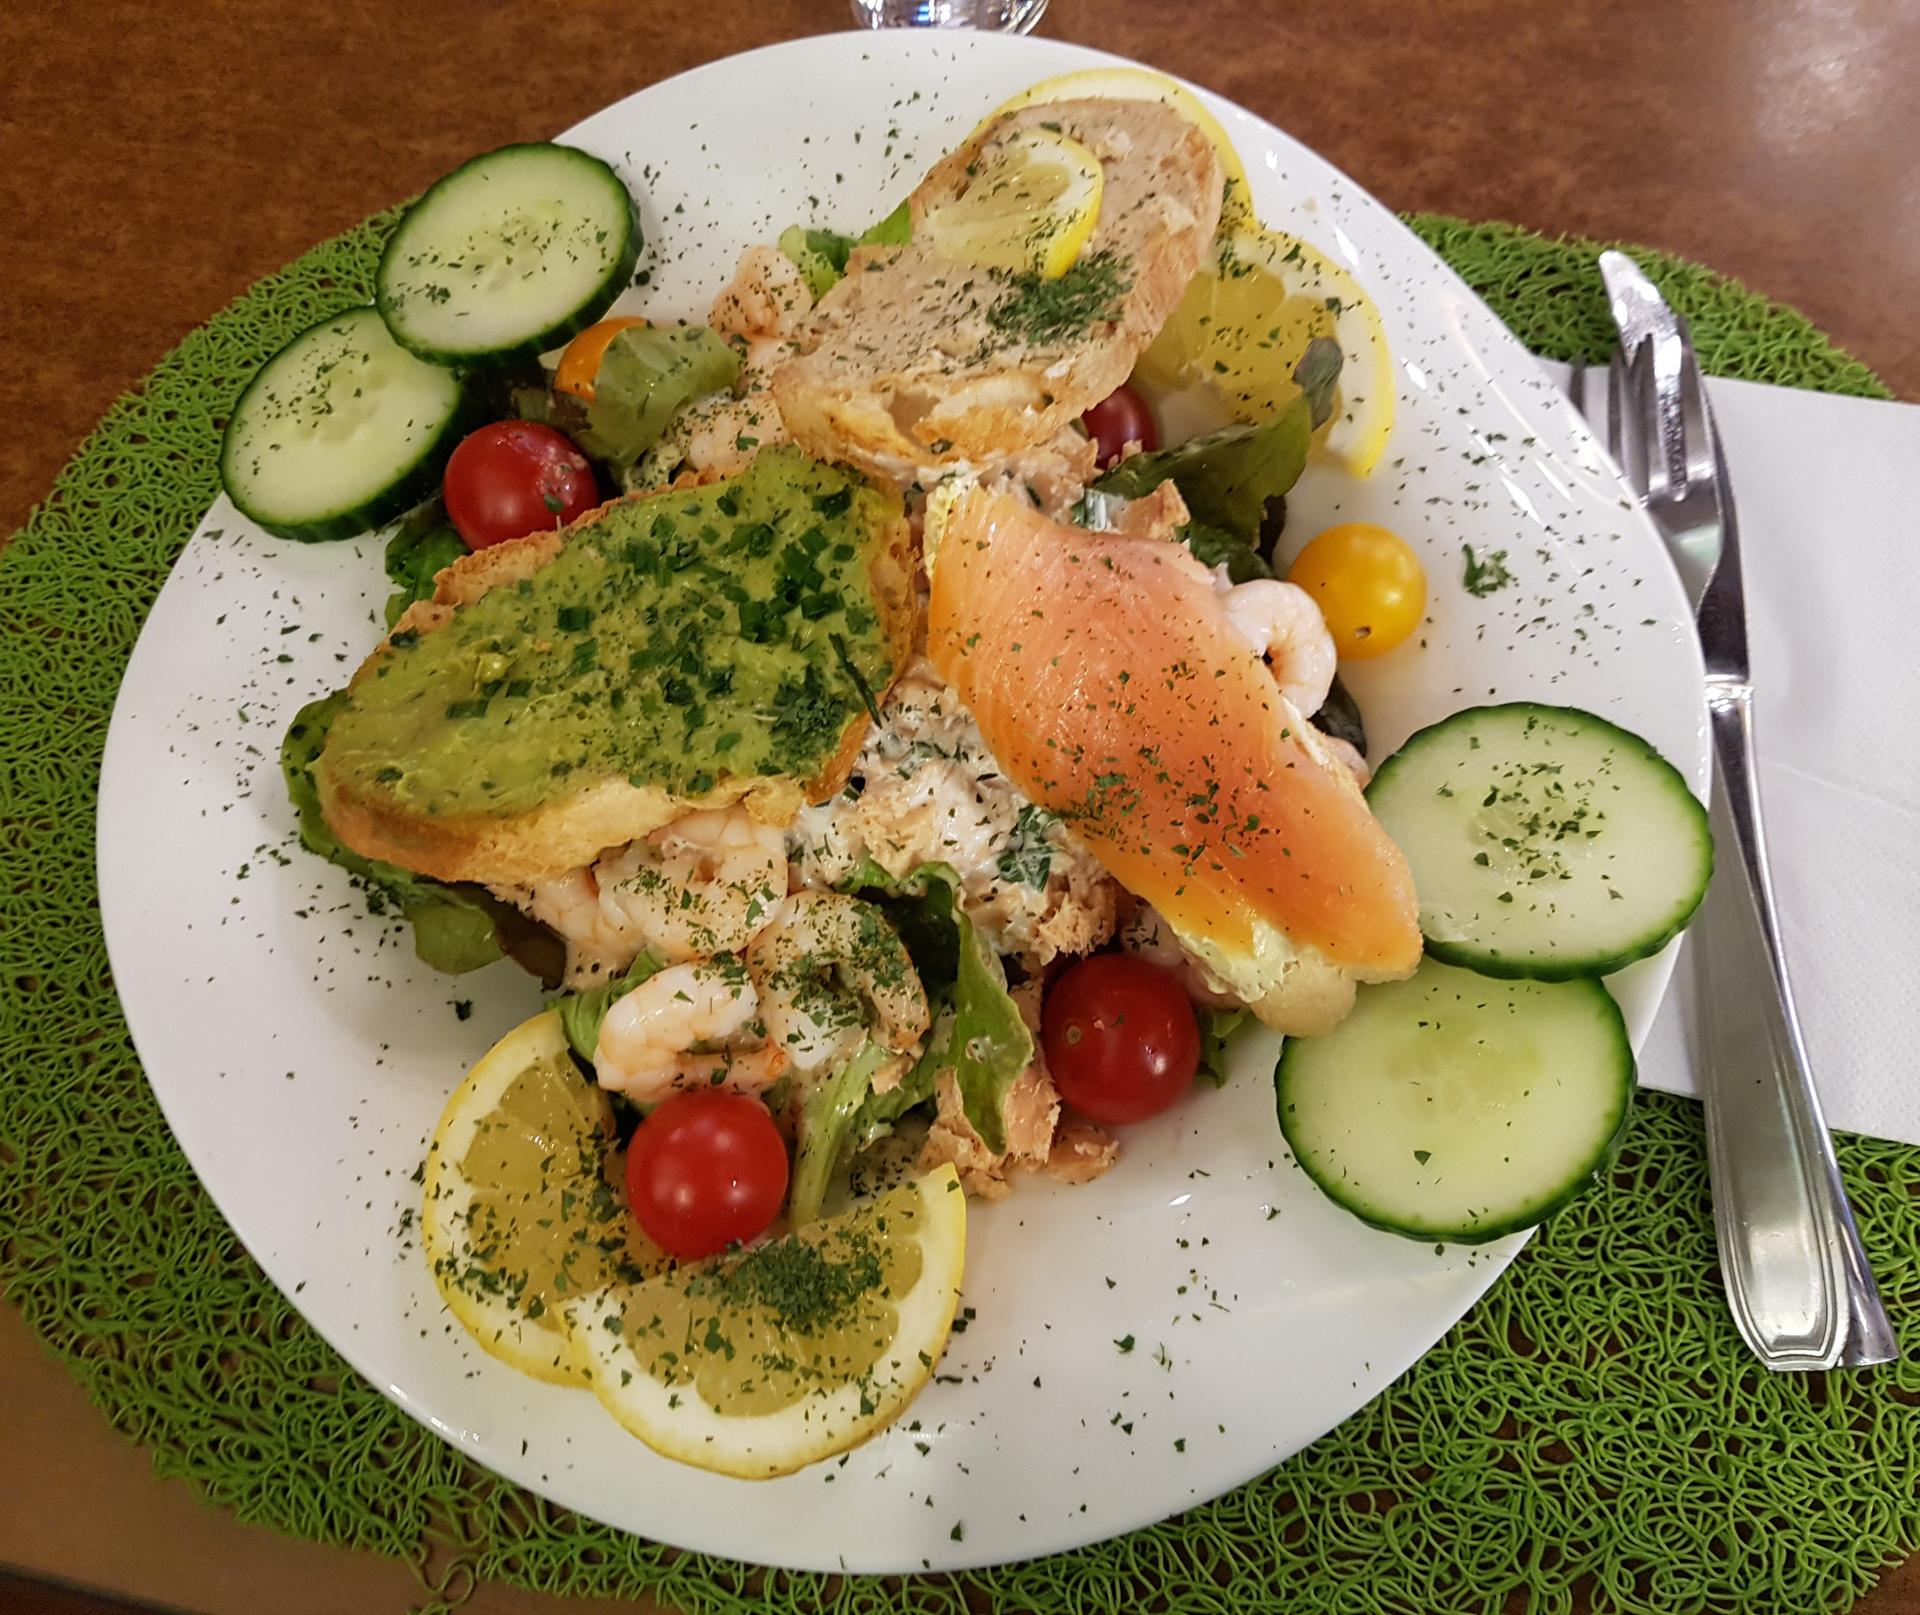 Salade du jour oceane